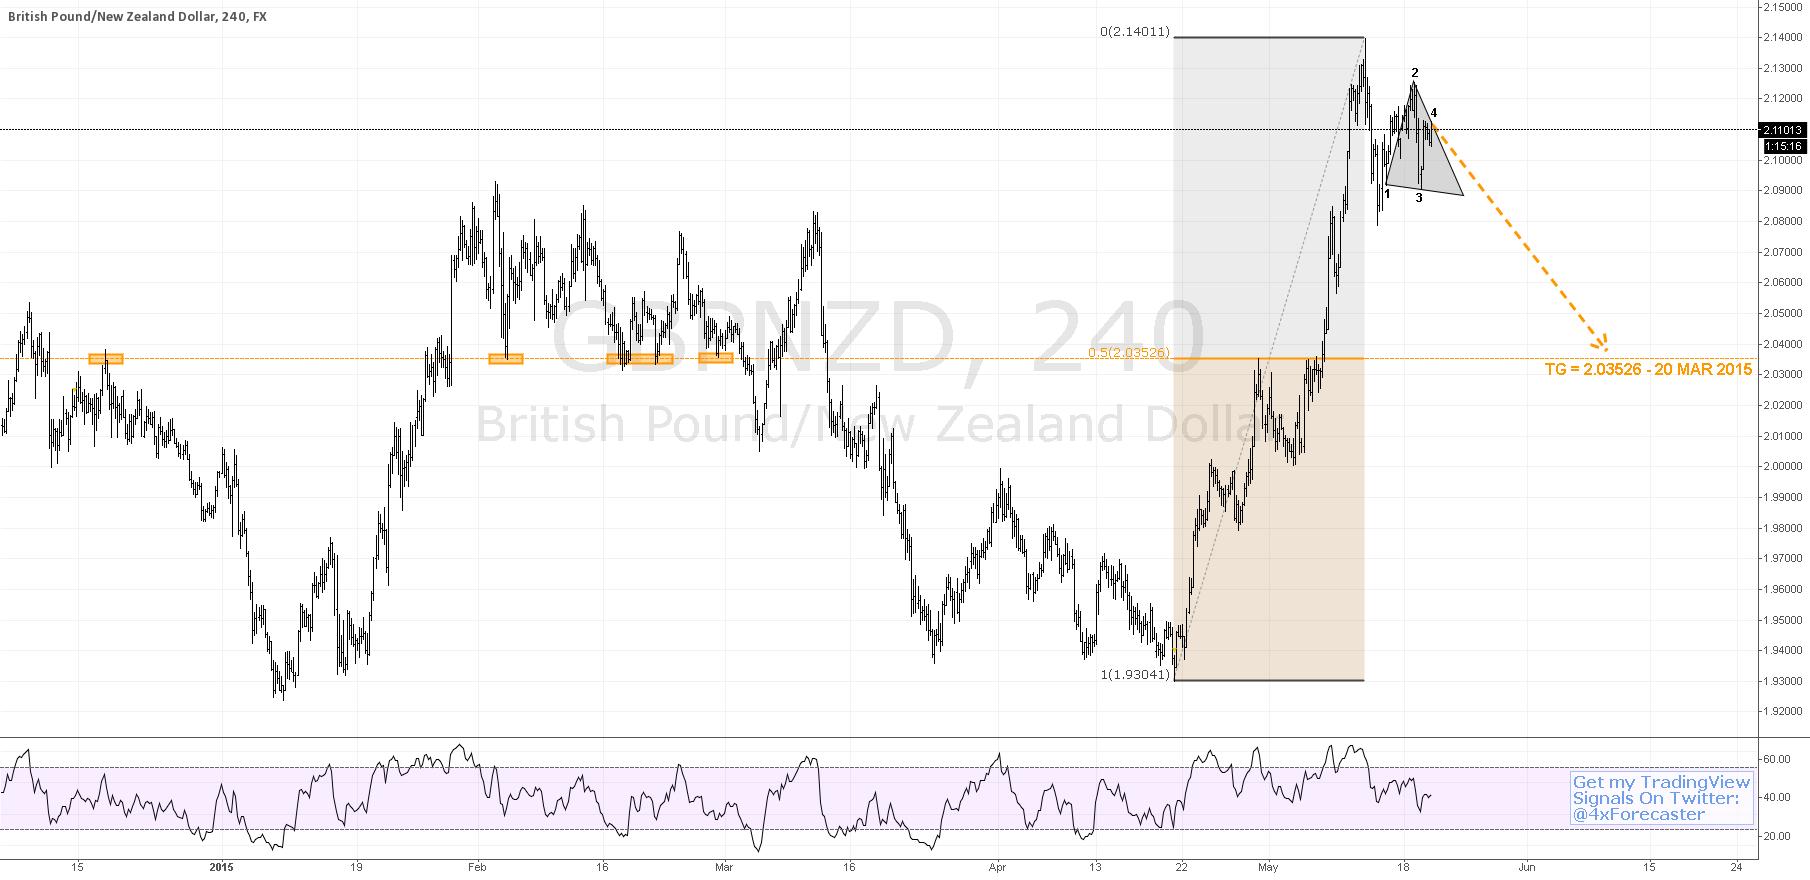 $GBP vs. $NZD Mulls 50% Decine To 2.03526 | #BOE #forex $USD